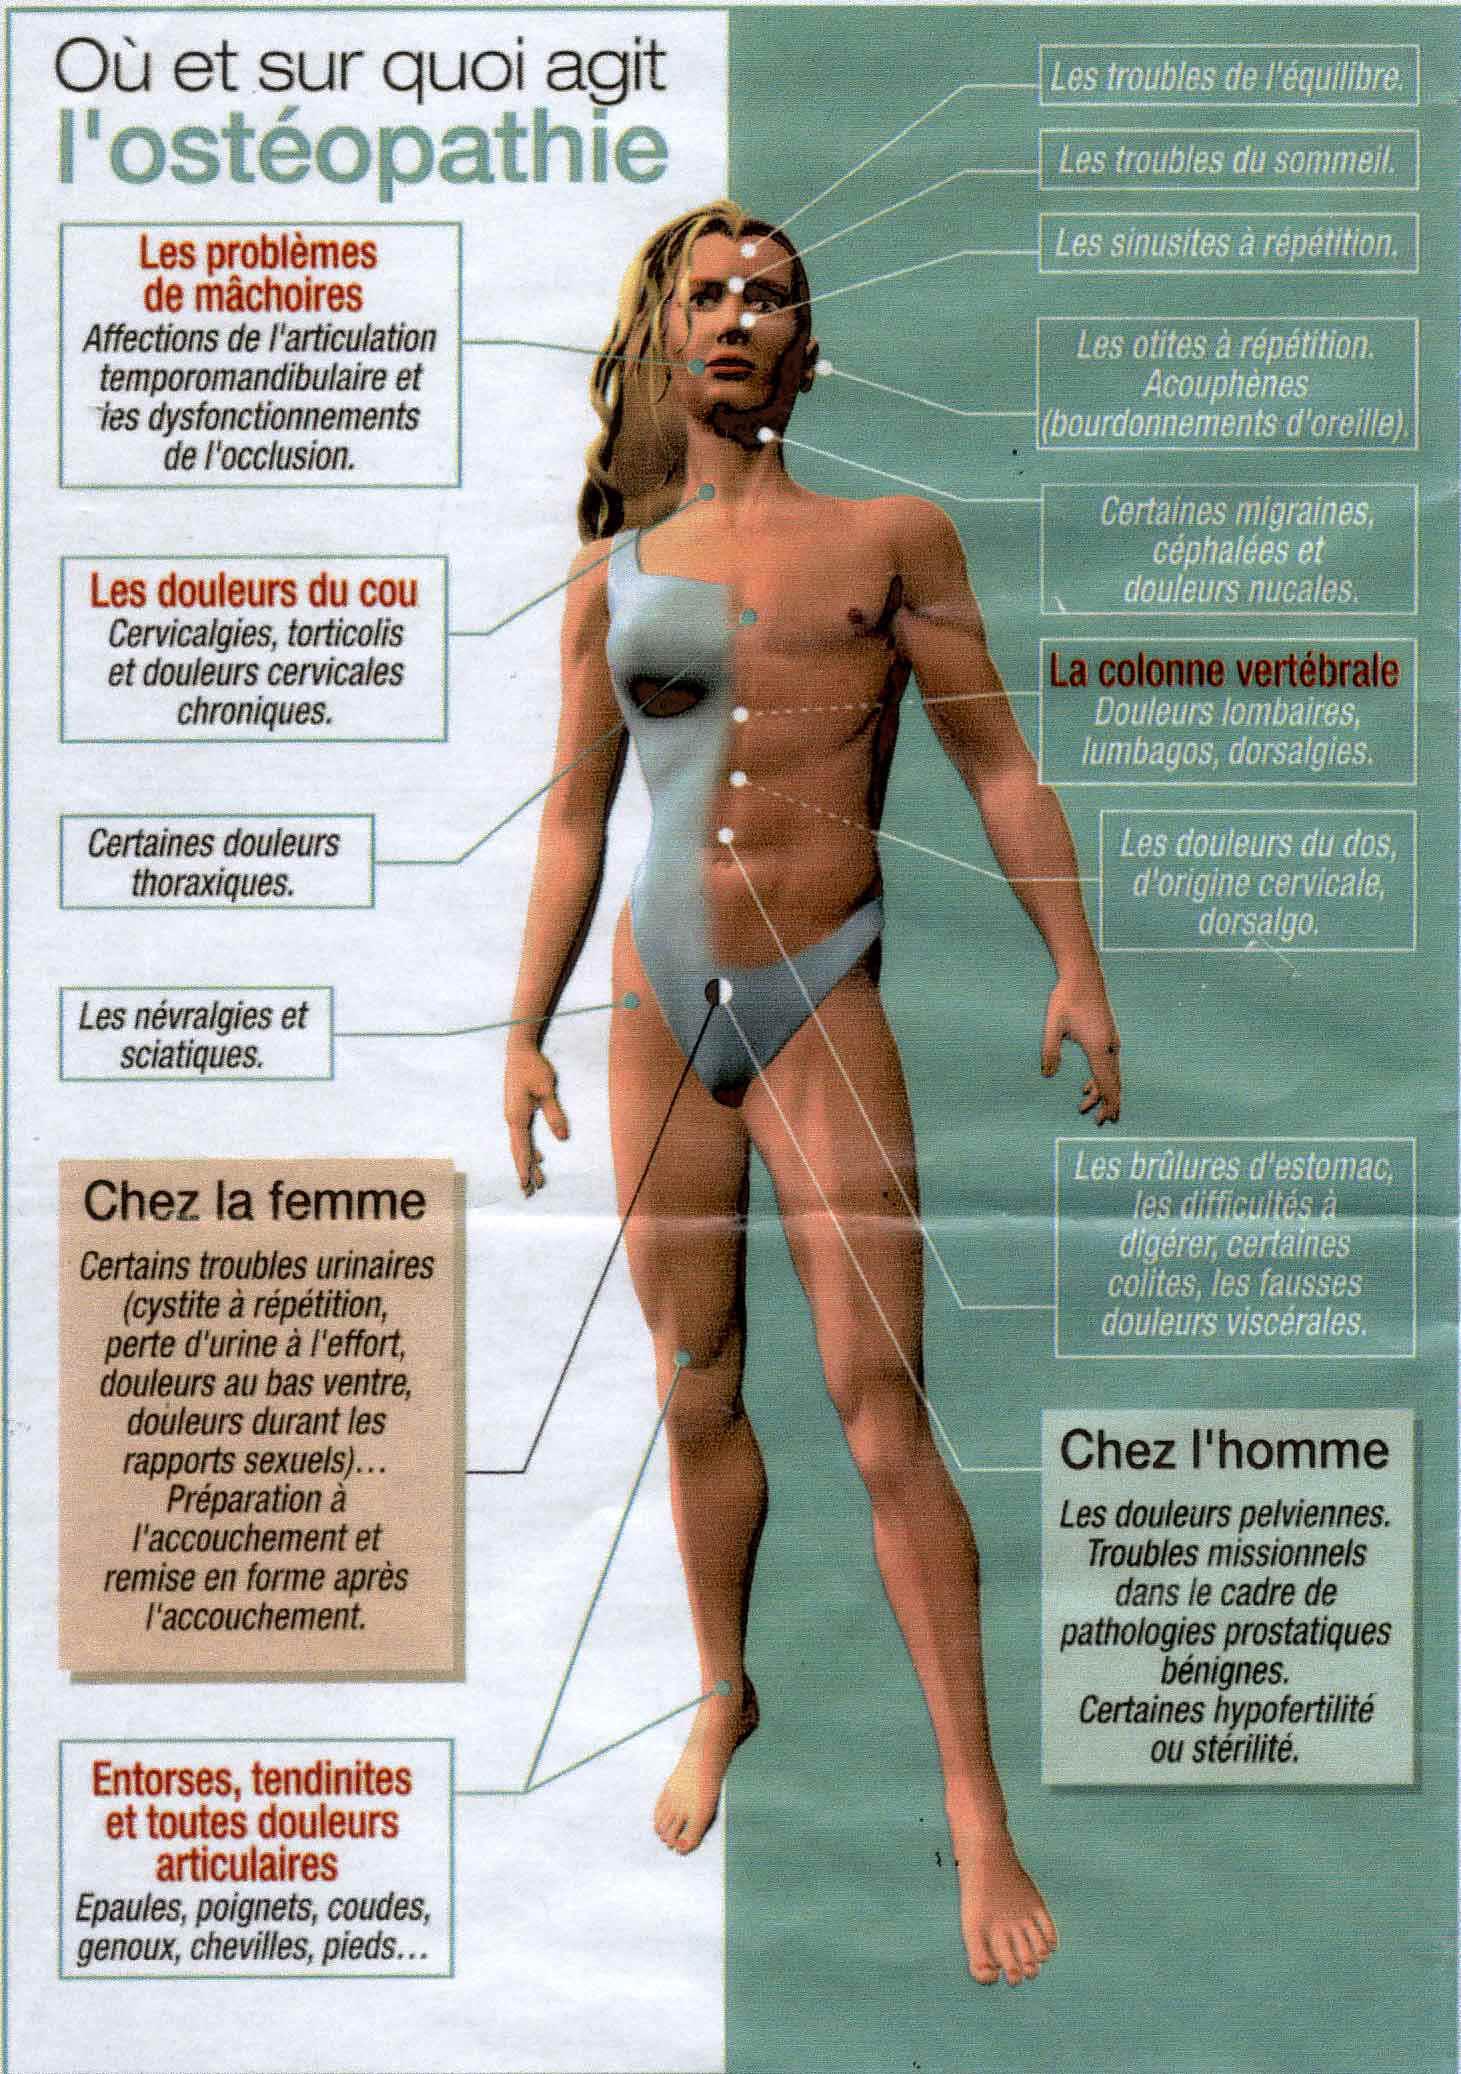 LE GUILLANTON Alexandre - Ostéopathe - 7-Indications